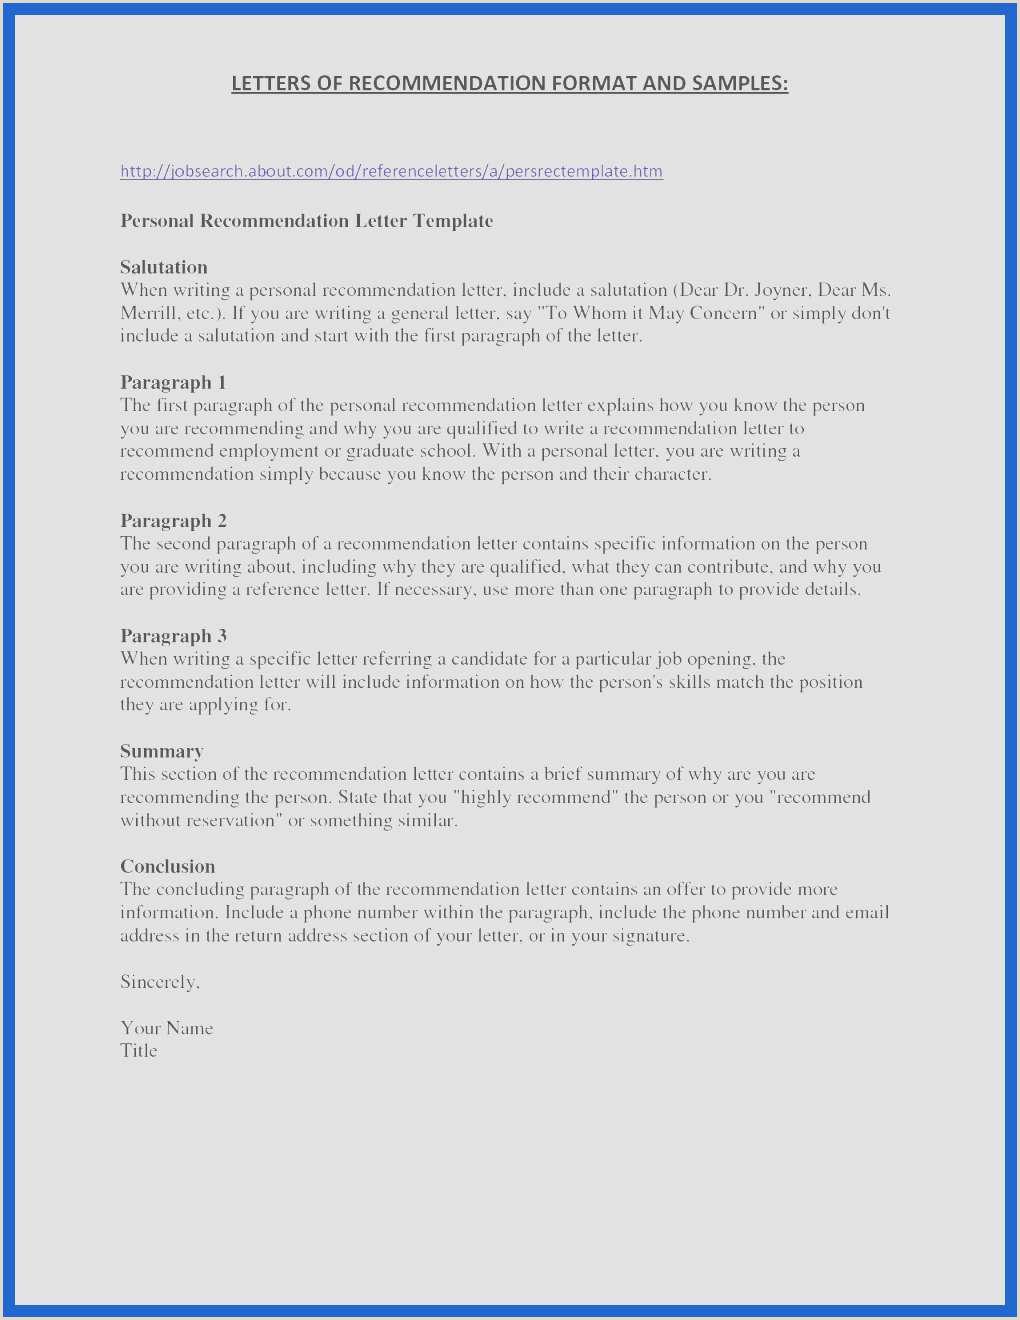 Executive assistant Cover Letter 2017 Unique Administrative assistant Resume Templates 2017 2017